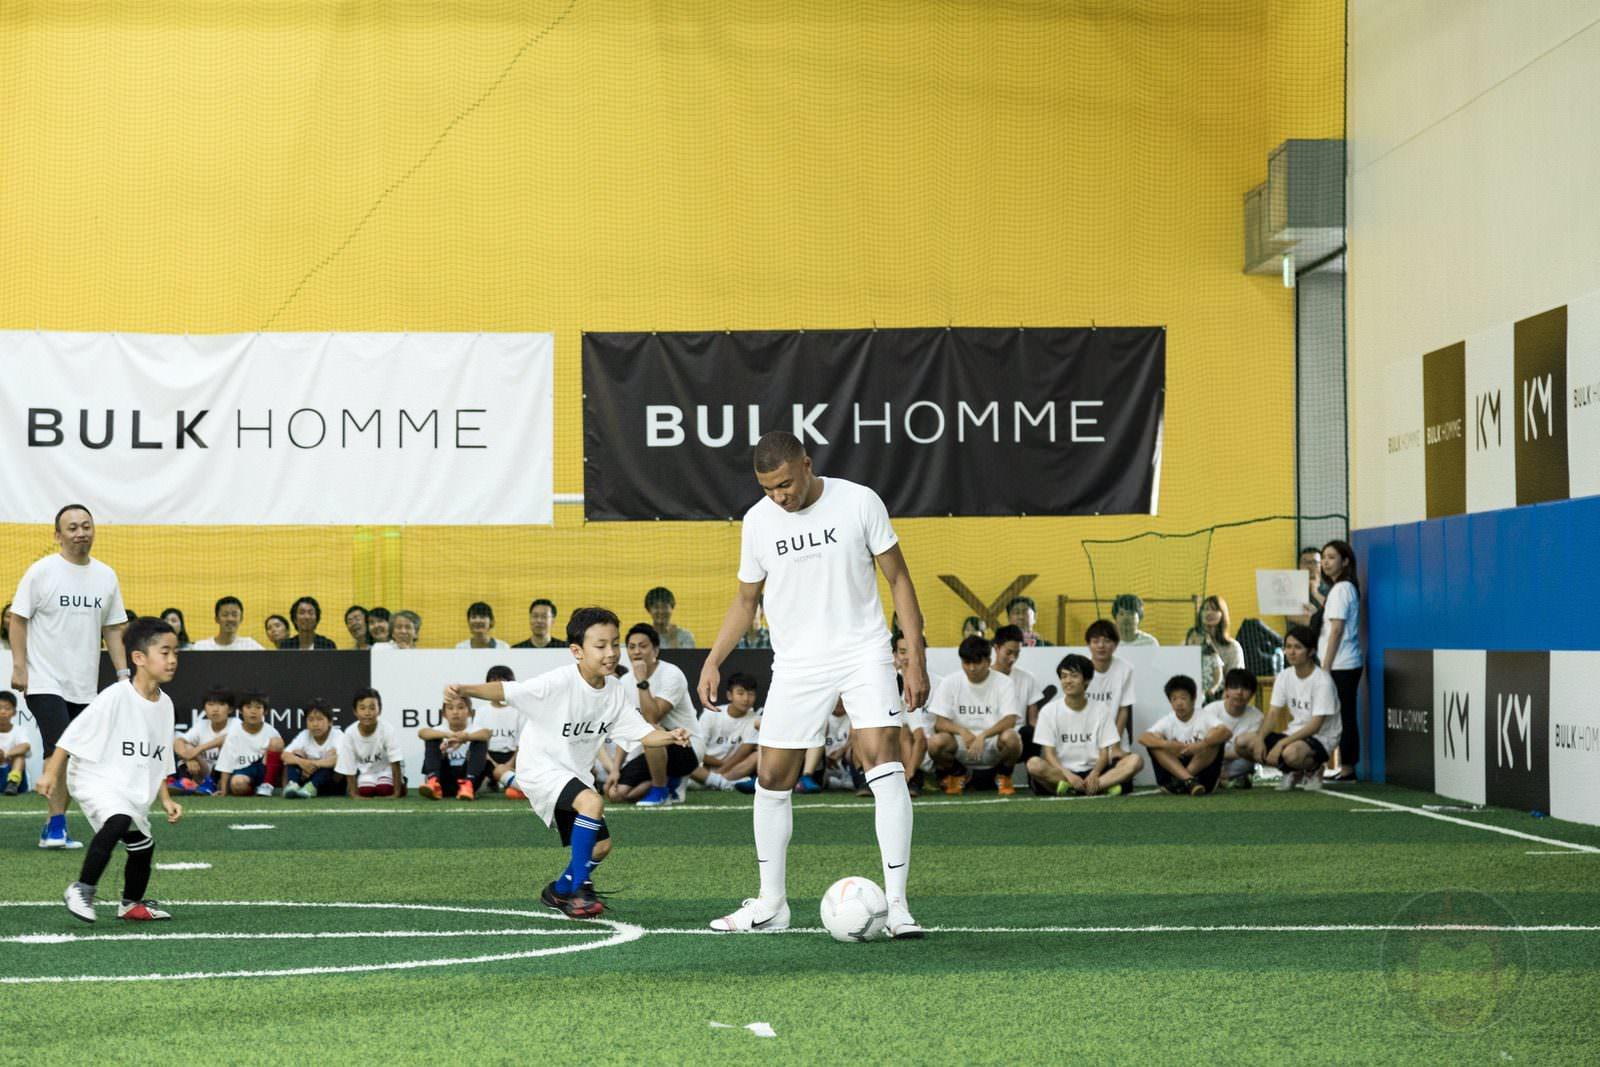 Kylian Mbappé plays soccer with kids 05